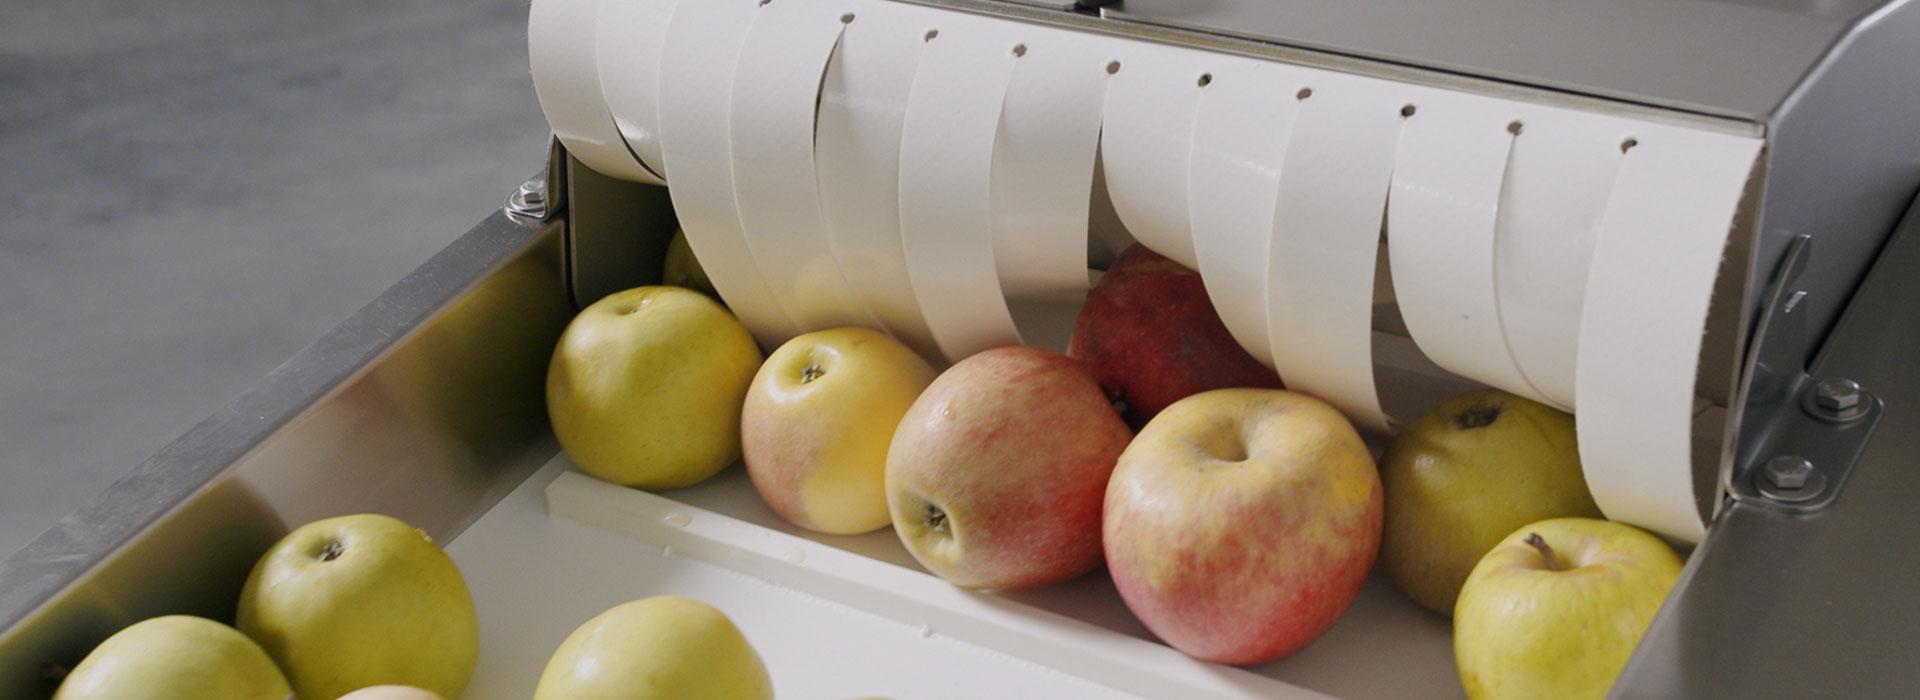 sraml-fruit-vegetable